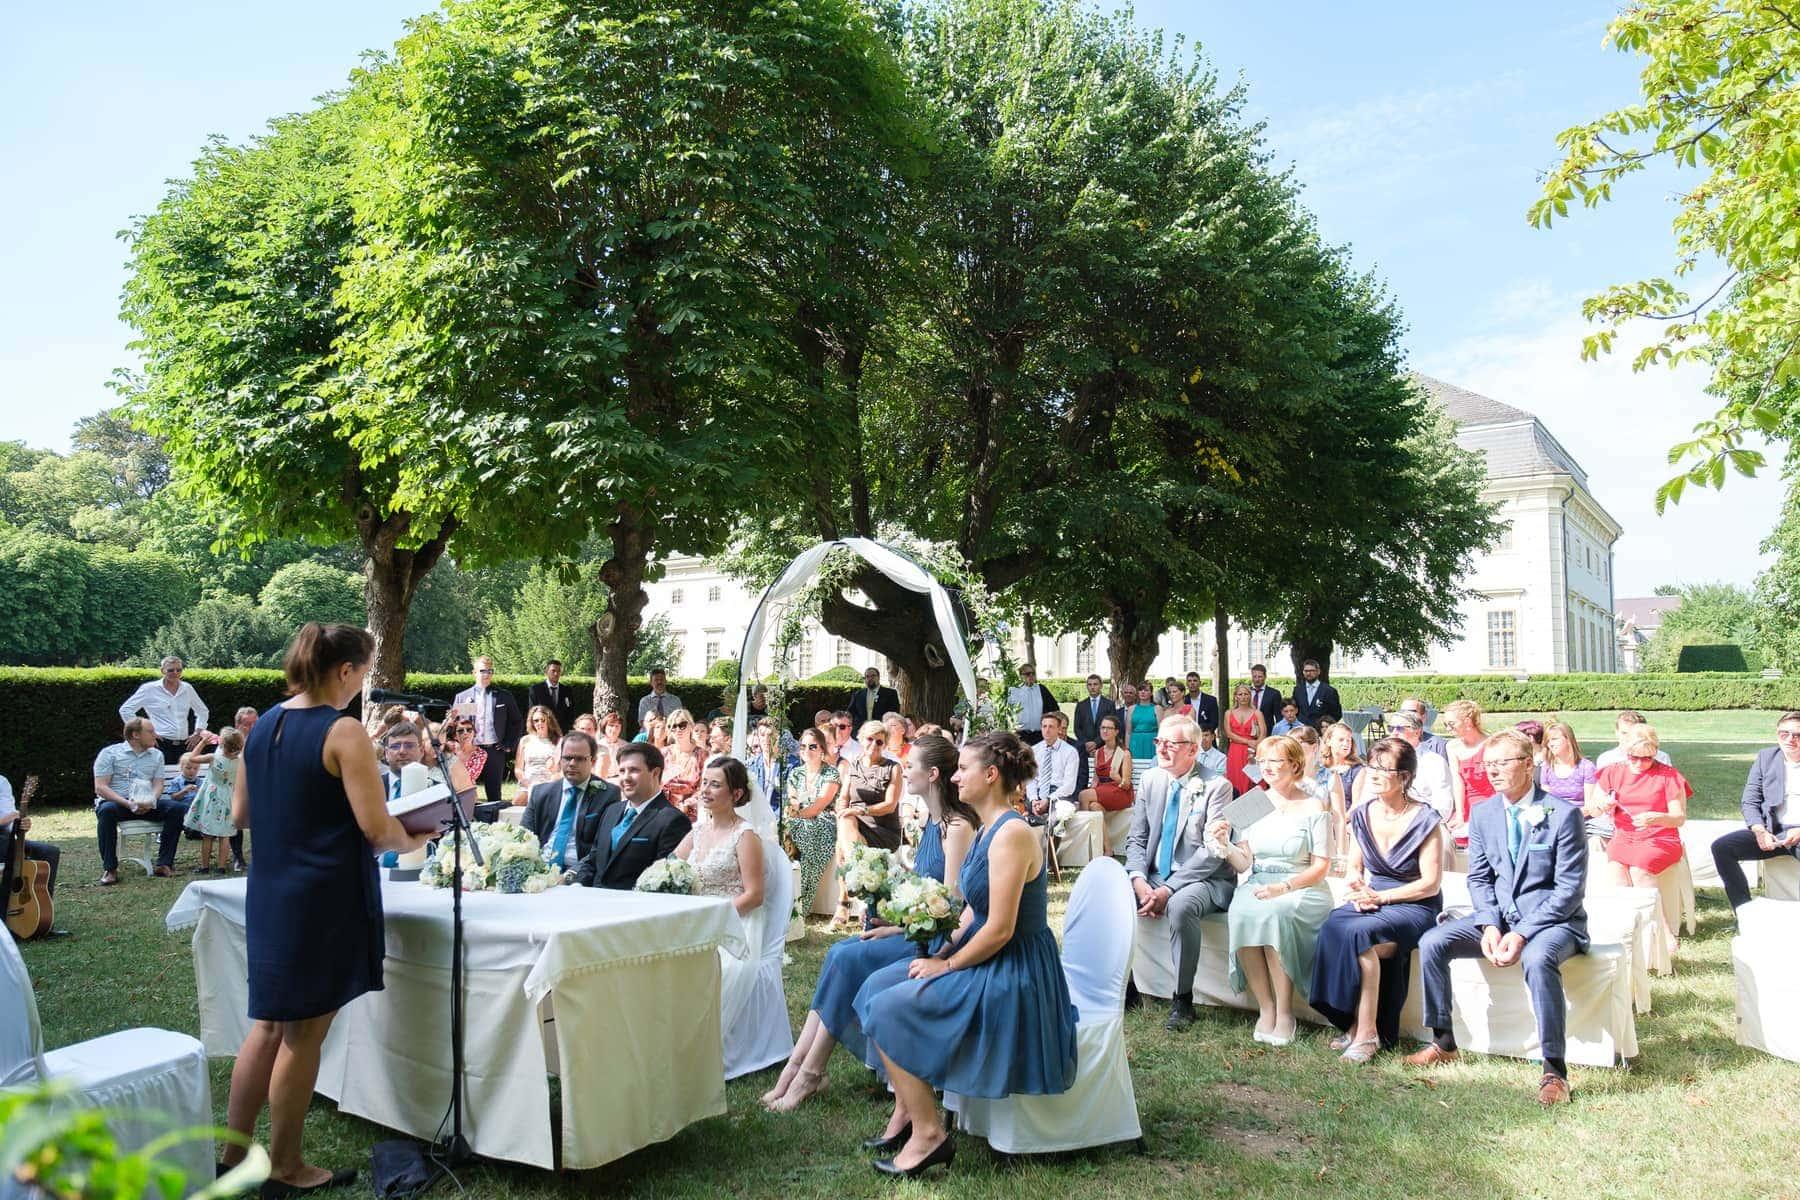 Hochzeitsgesellschaft im Grünen vor Schloss